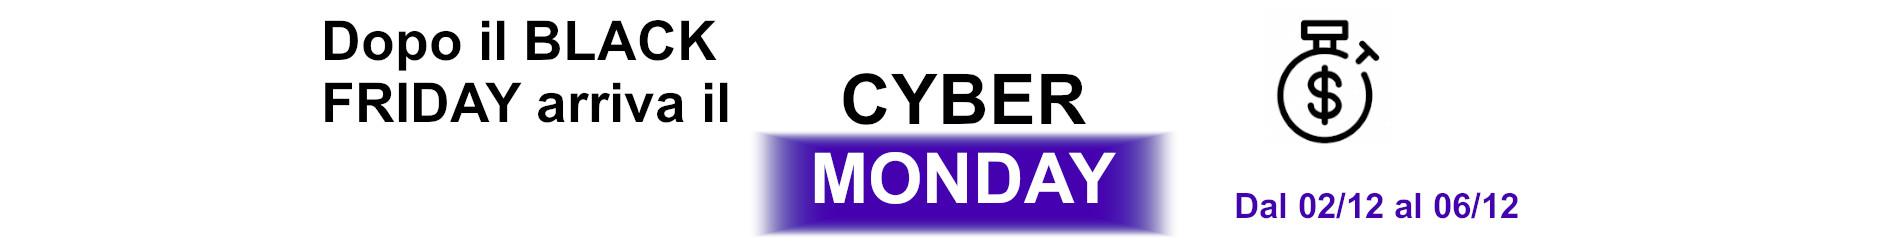 plaster-cyber-monday-2019-pmma-policarbonato-lexan-pellicole-pvc-forex-pet-petg-dibond-alupanel